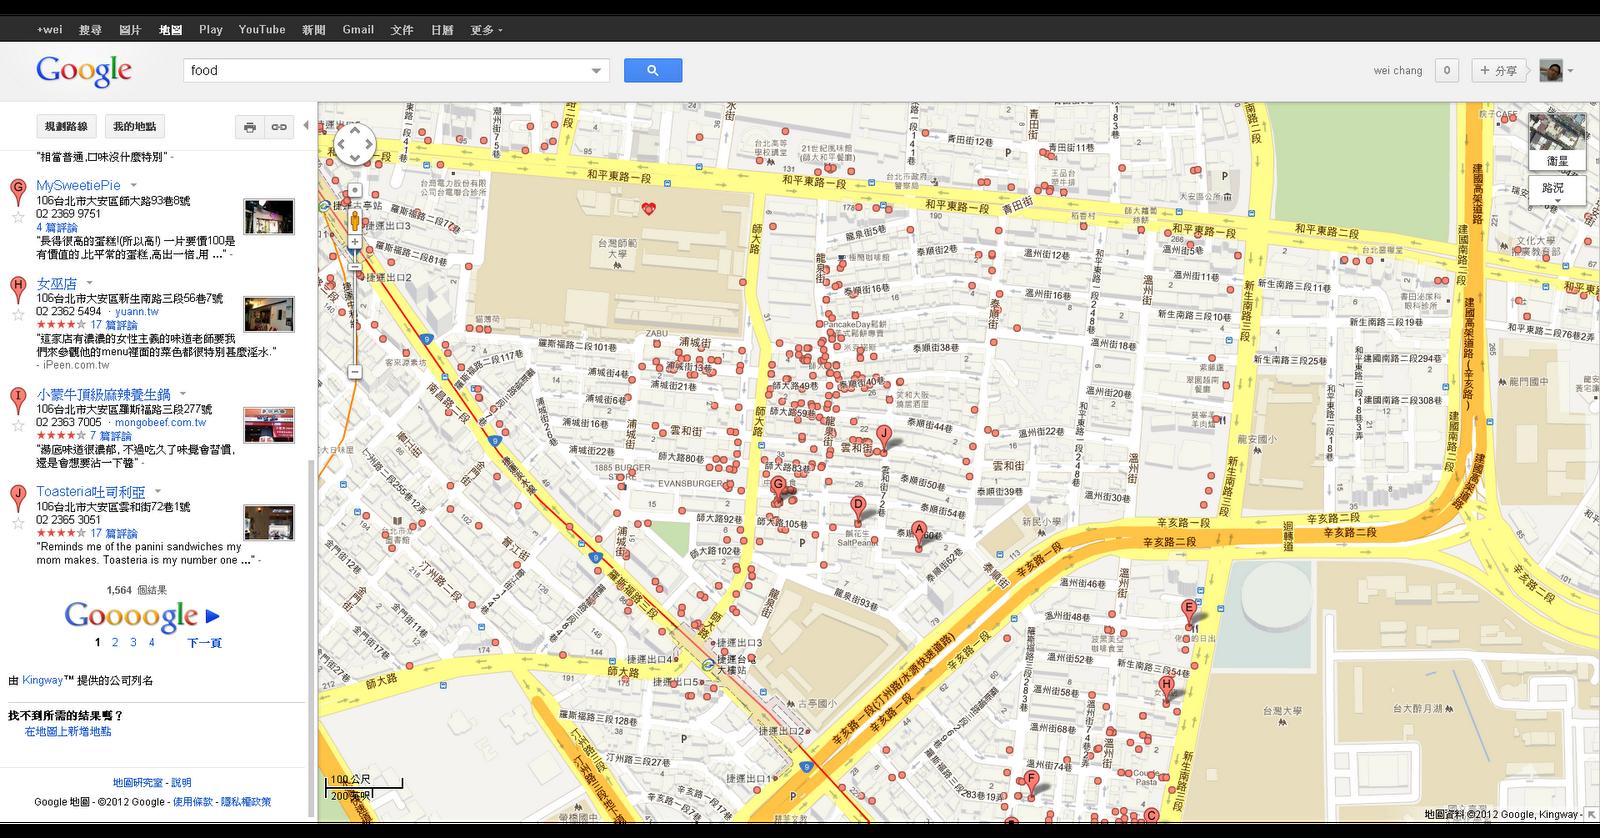 Wei's code: 如何使用Google Map Api 找出附近的餐廳